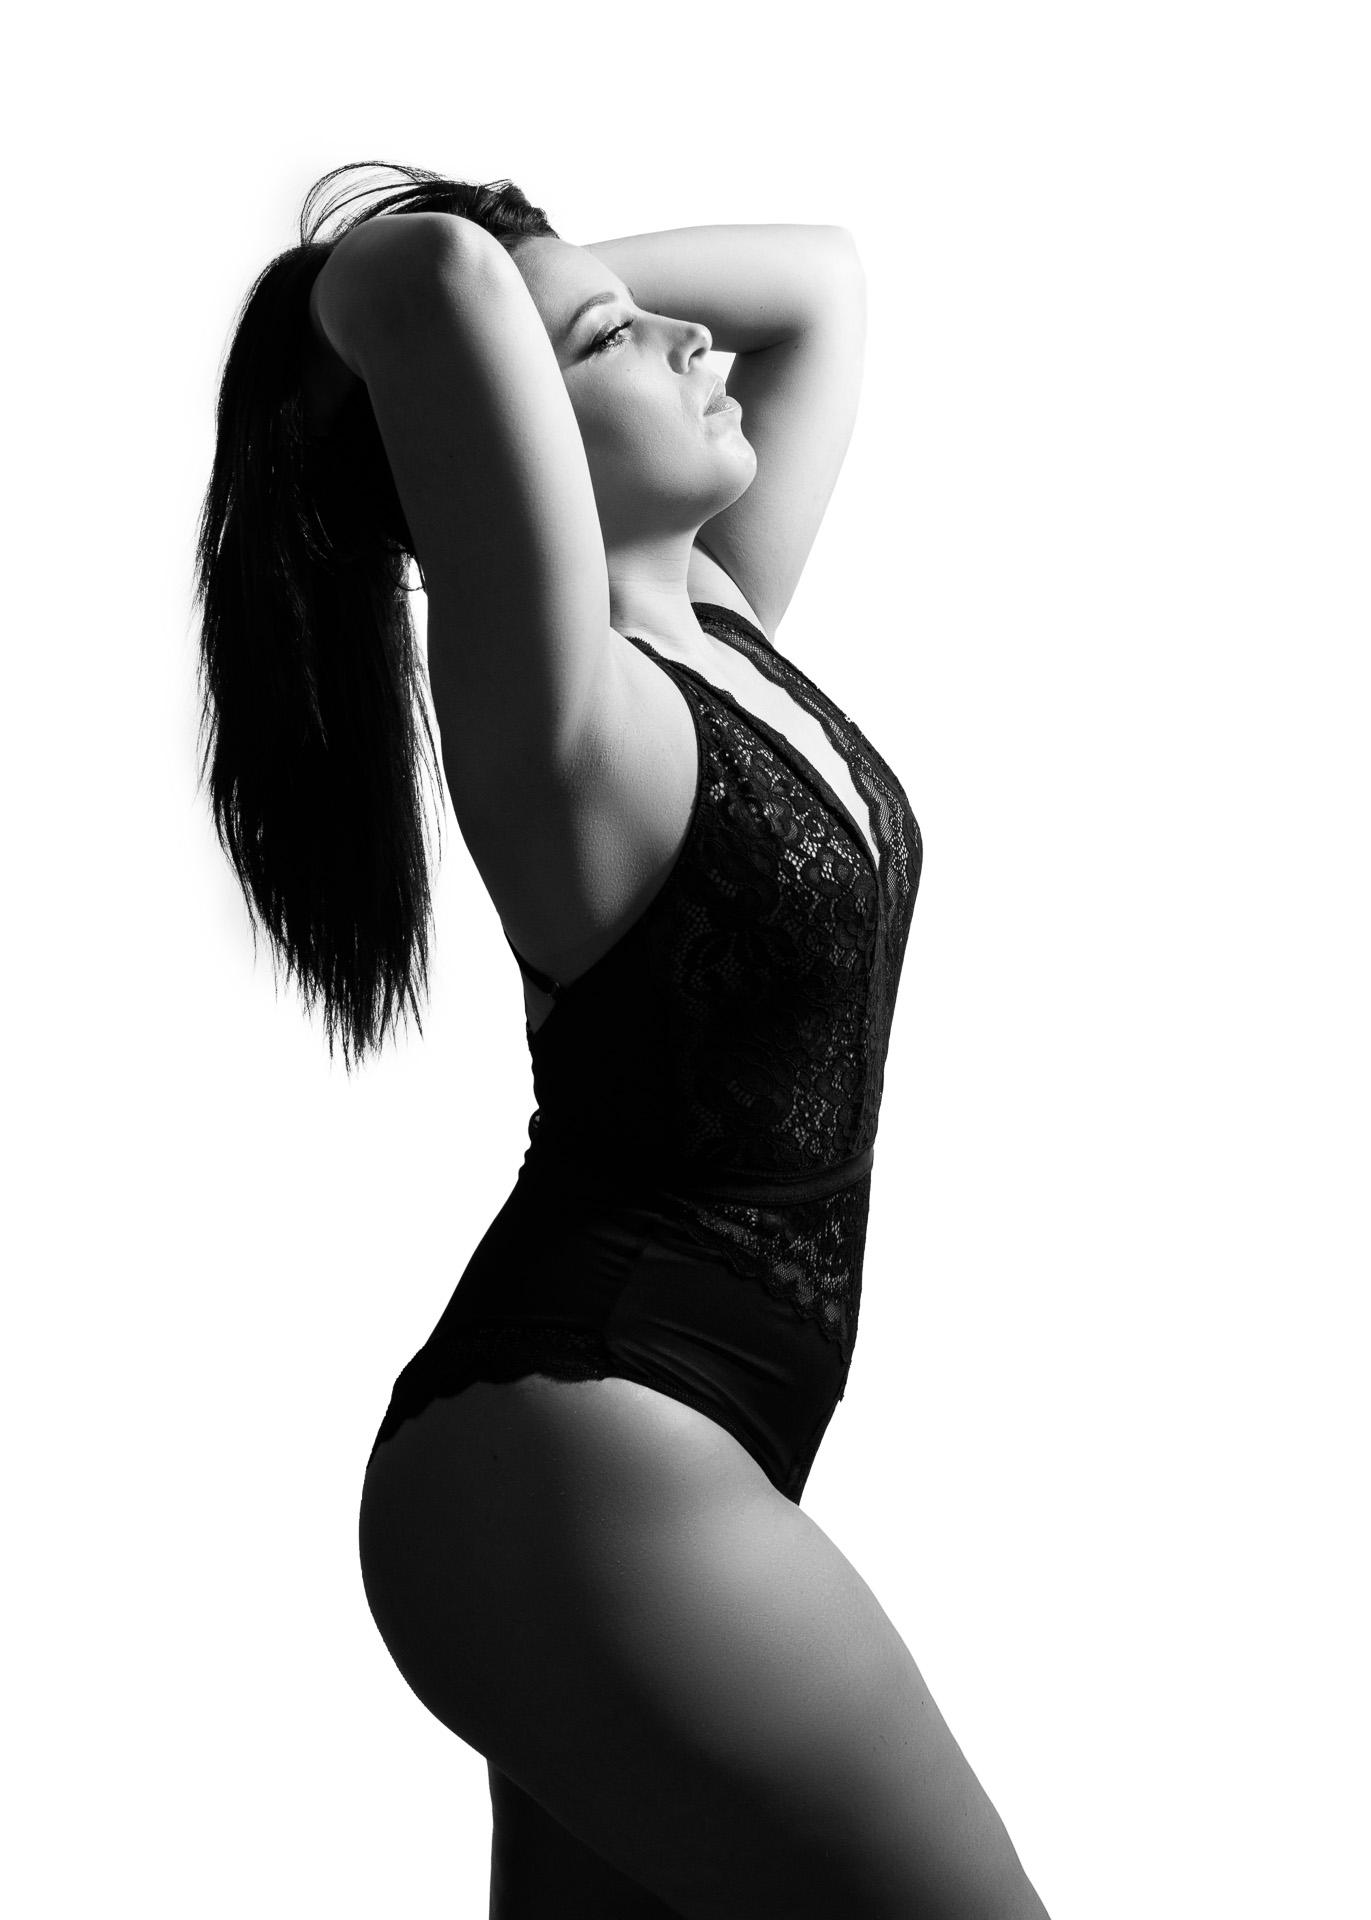 photo femme lingerie body noir et blanc